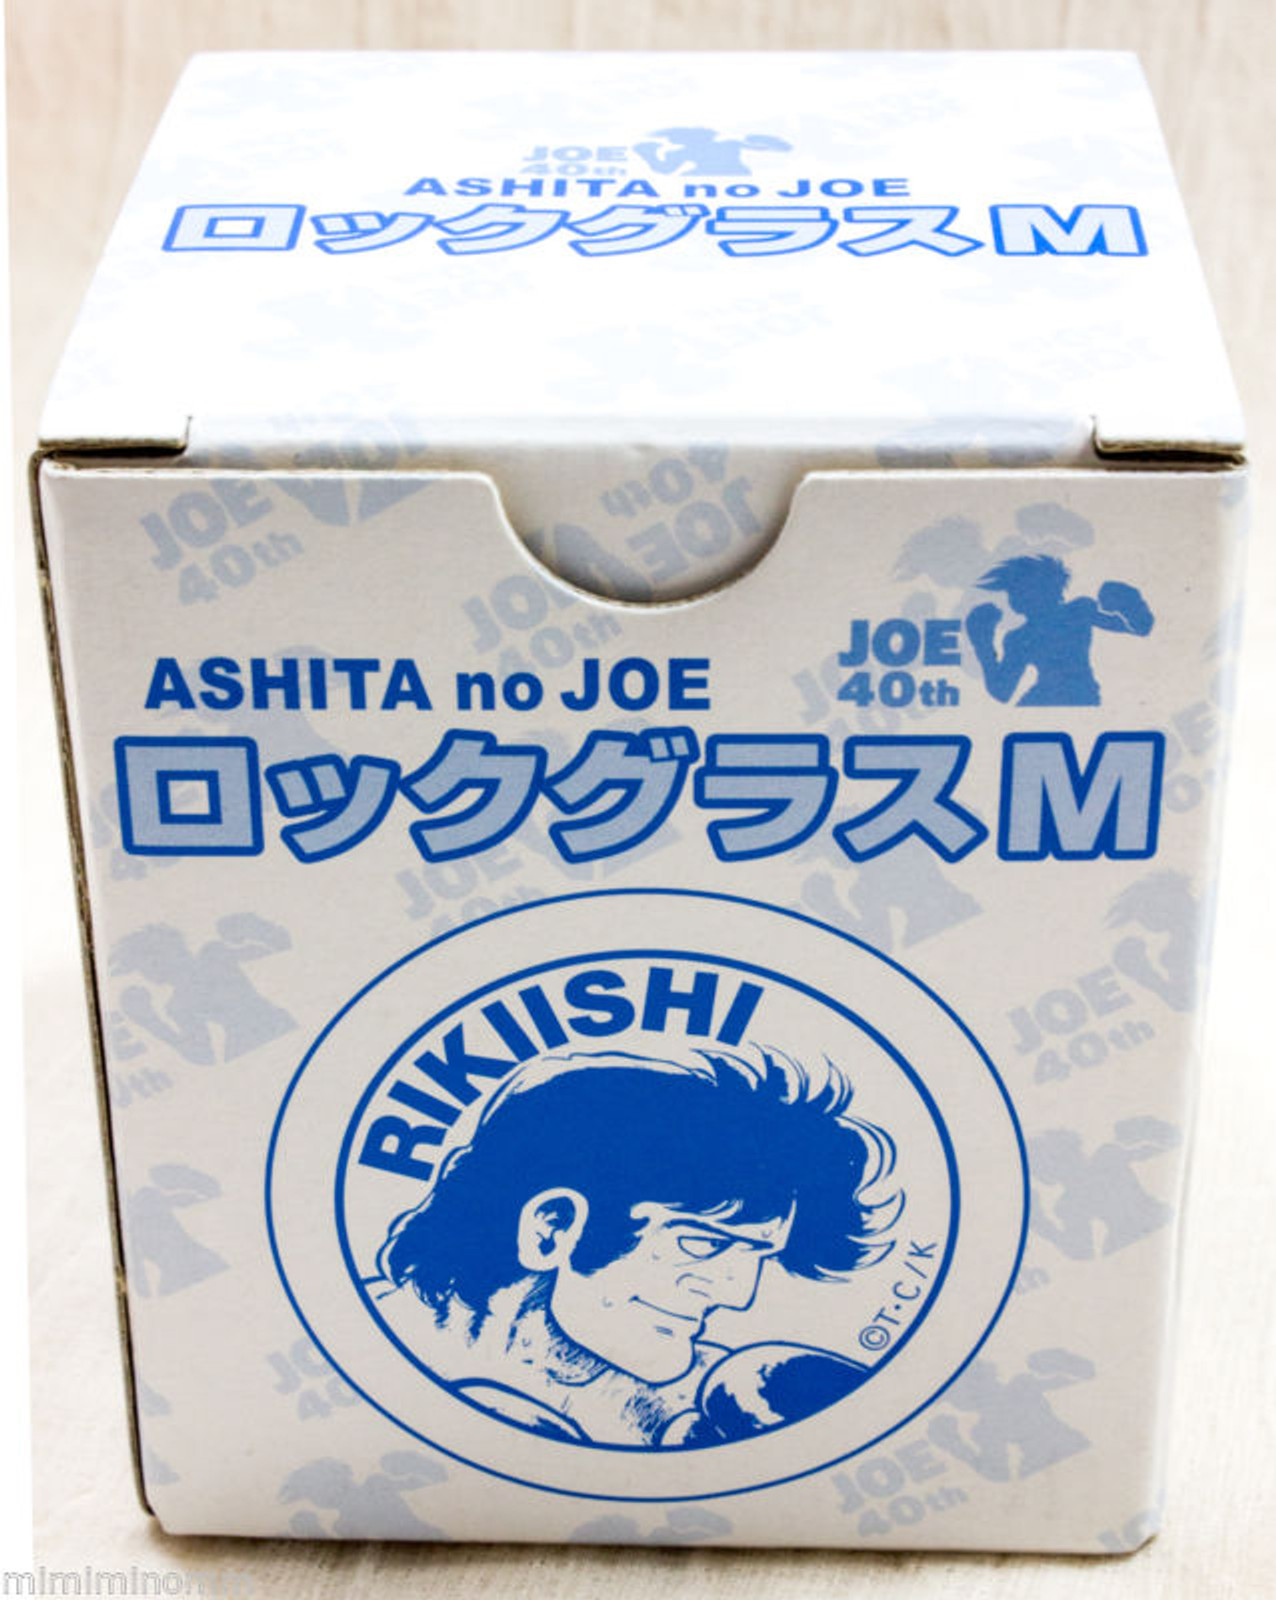 Ashita no Joe ROKIISHI Rocks Glass JOE 40th Anniversary JAPAN ANIME MANGA